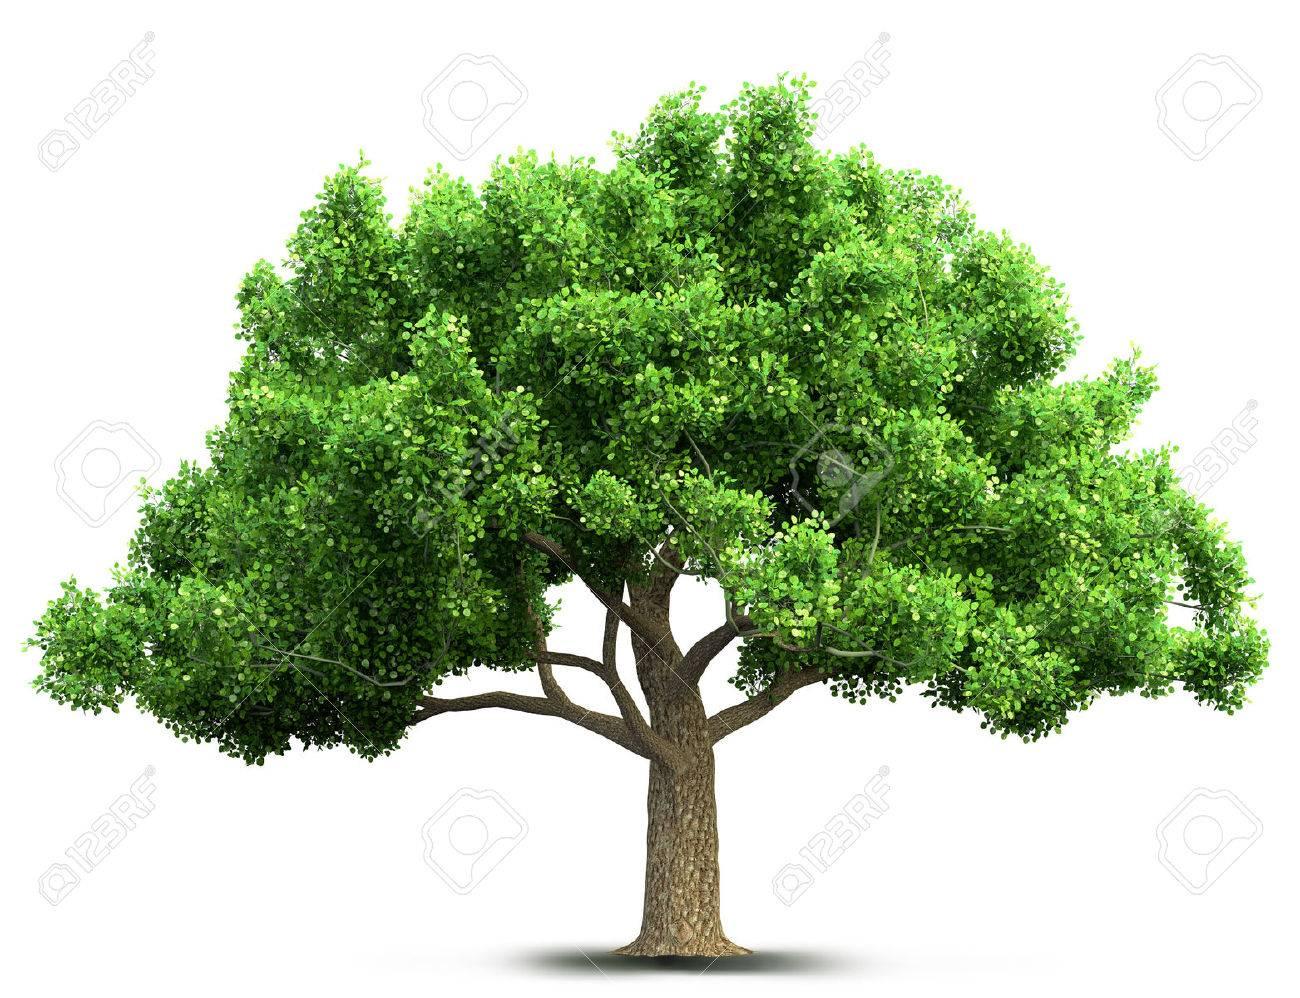 tree isolated 3D illustration - 64831972